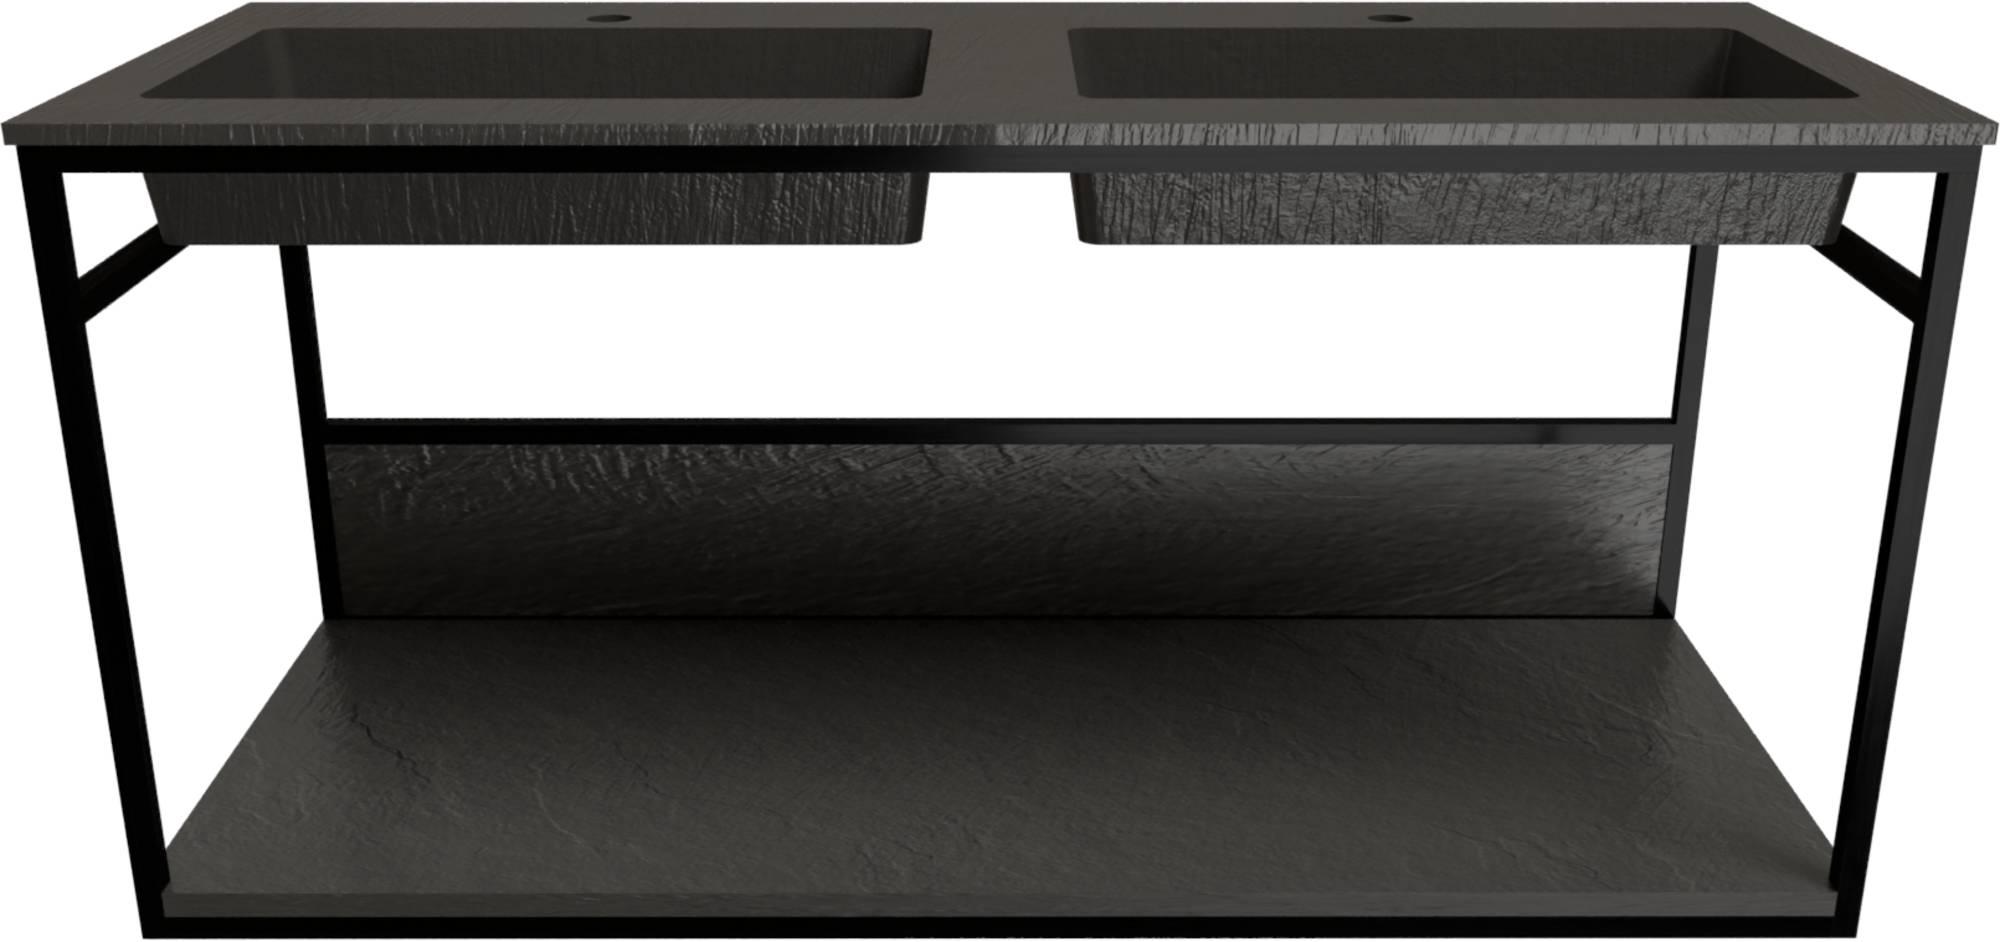 Ben Avira Set Muurframe met Wastafel 2 Krg. 120,3x46,5x52,3 cm Mat Zwart/Lava